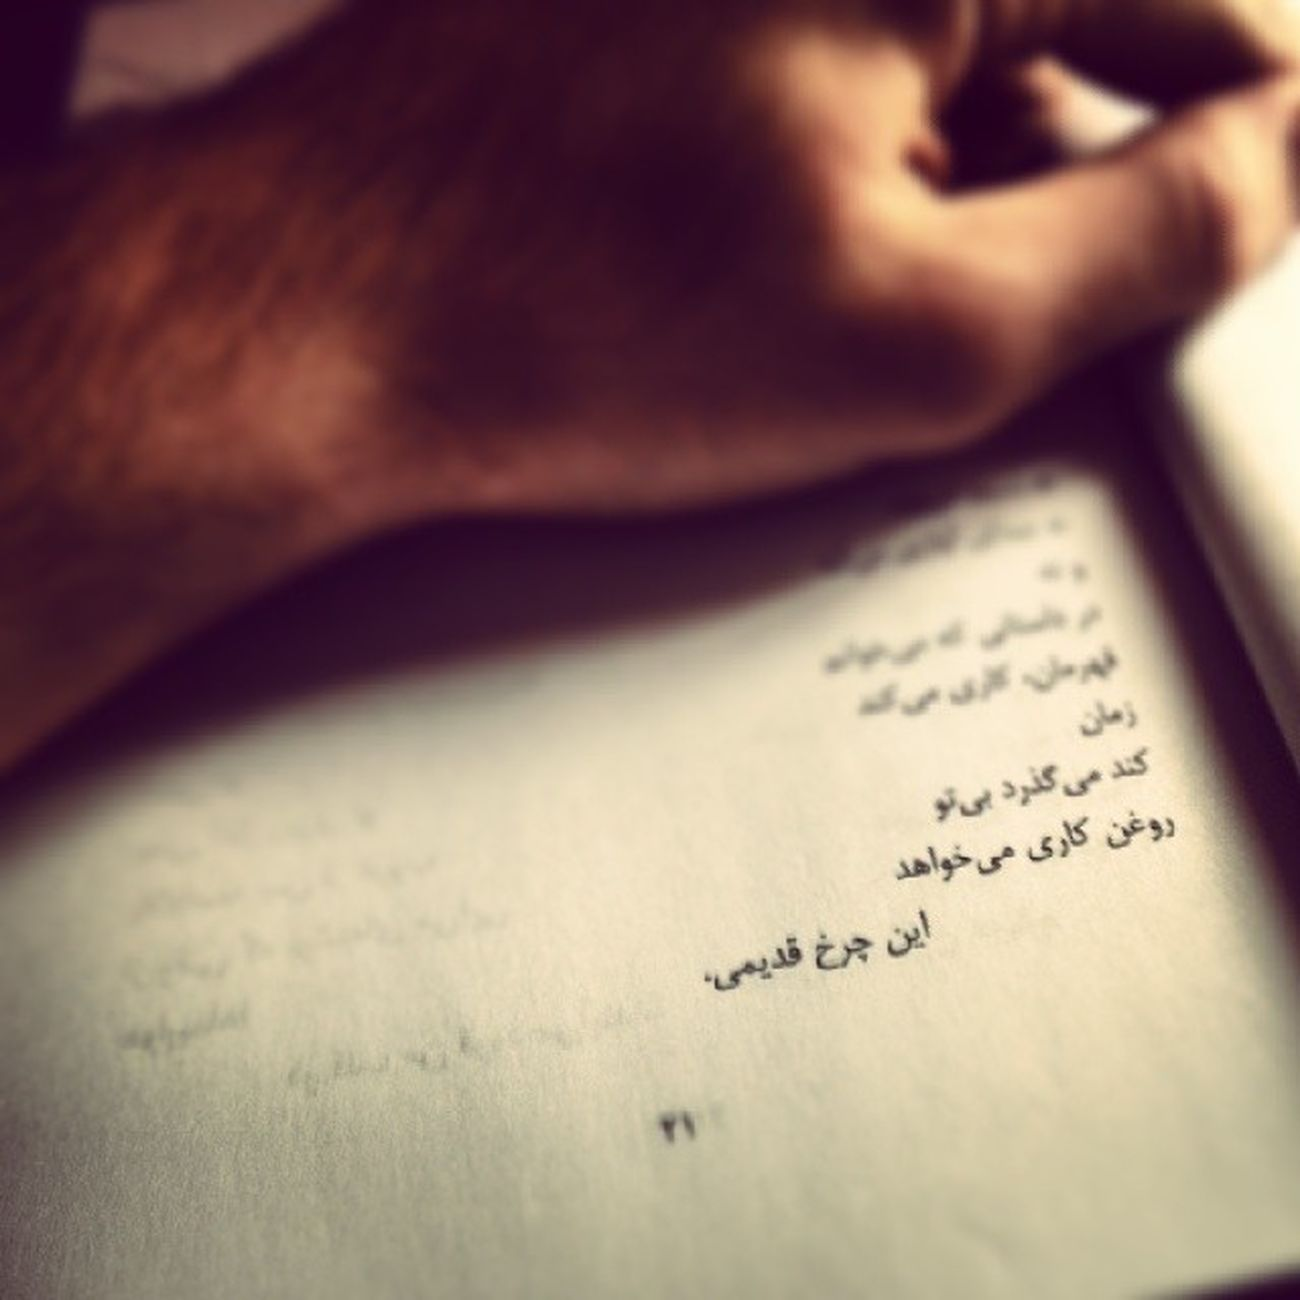 شعر کتاب رسول_یونان